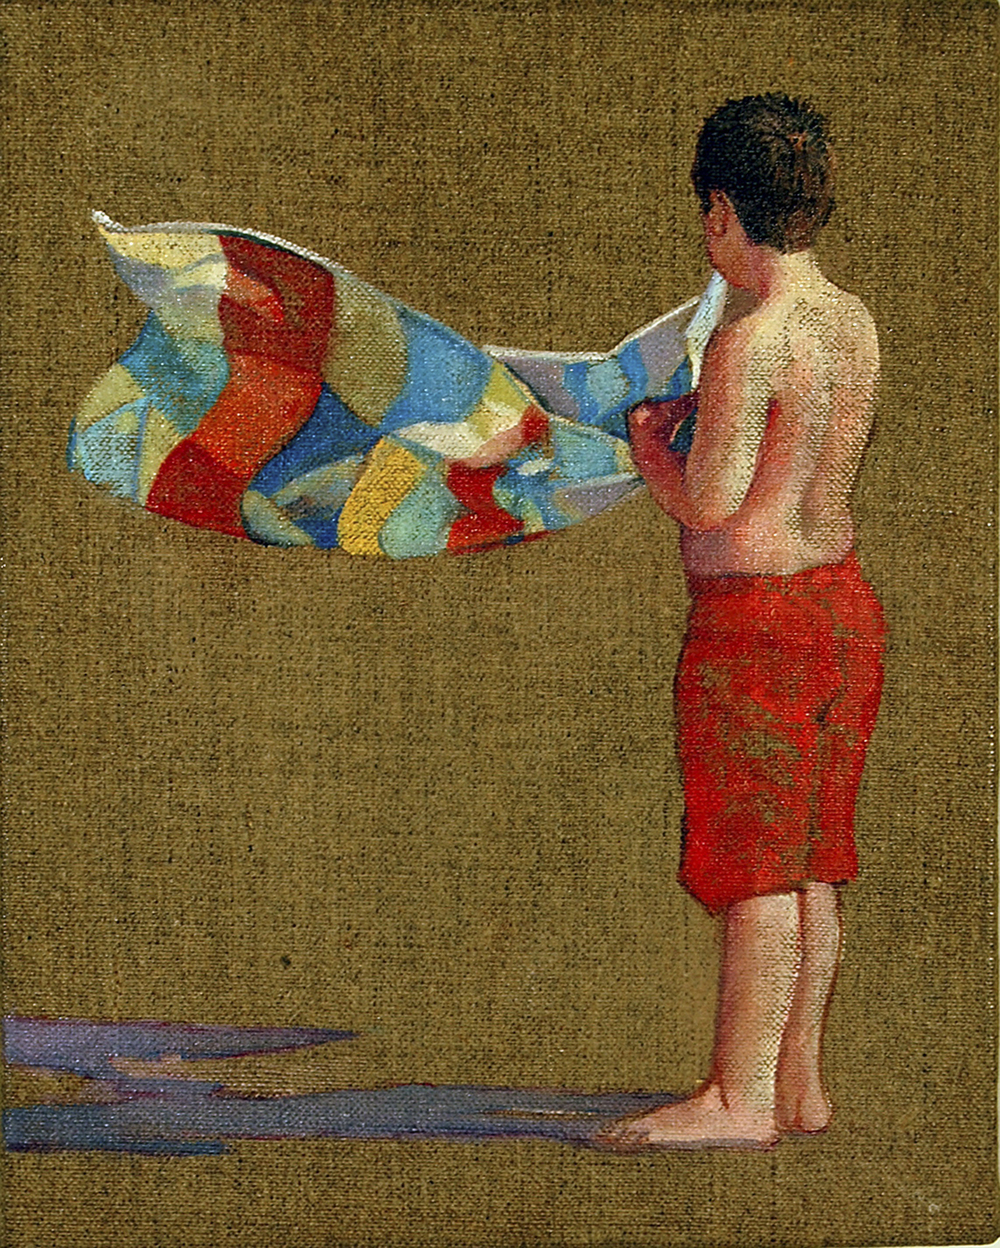 "Towel 4 oil on linen 10""x8""2009"